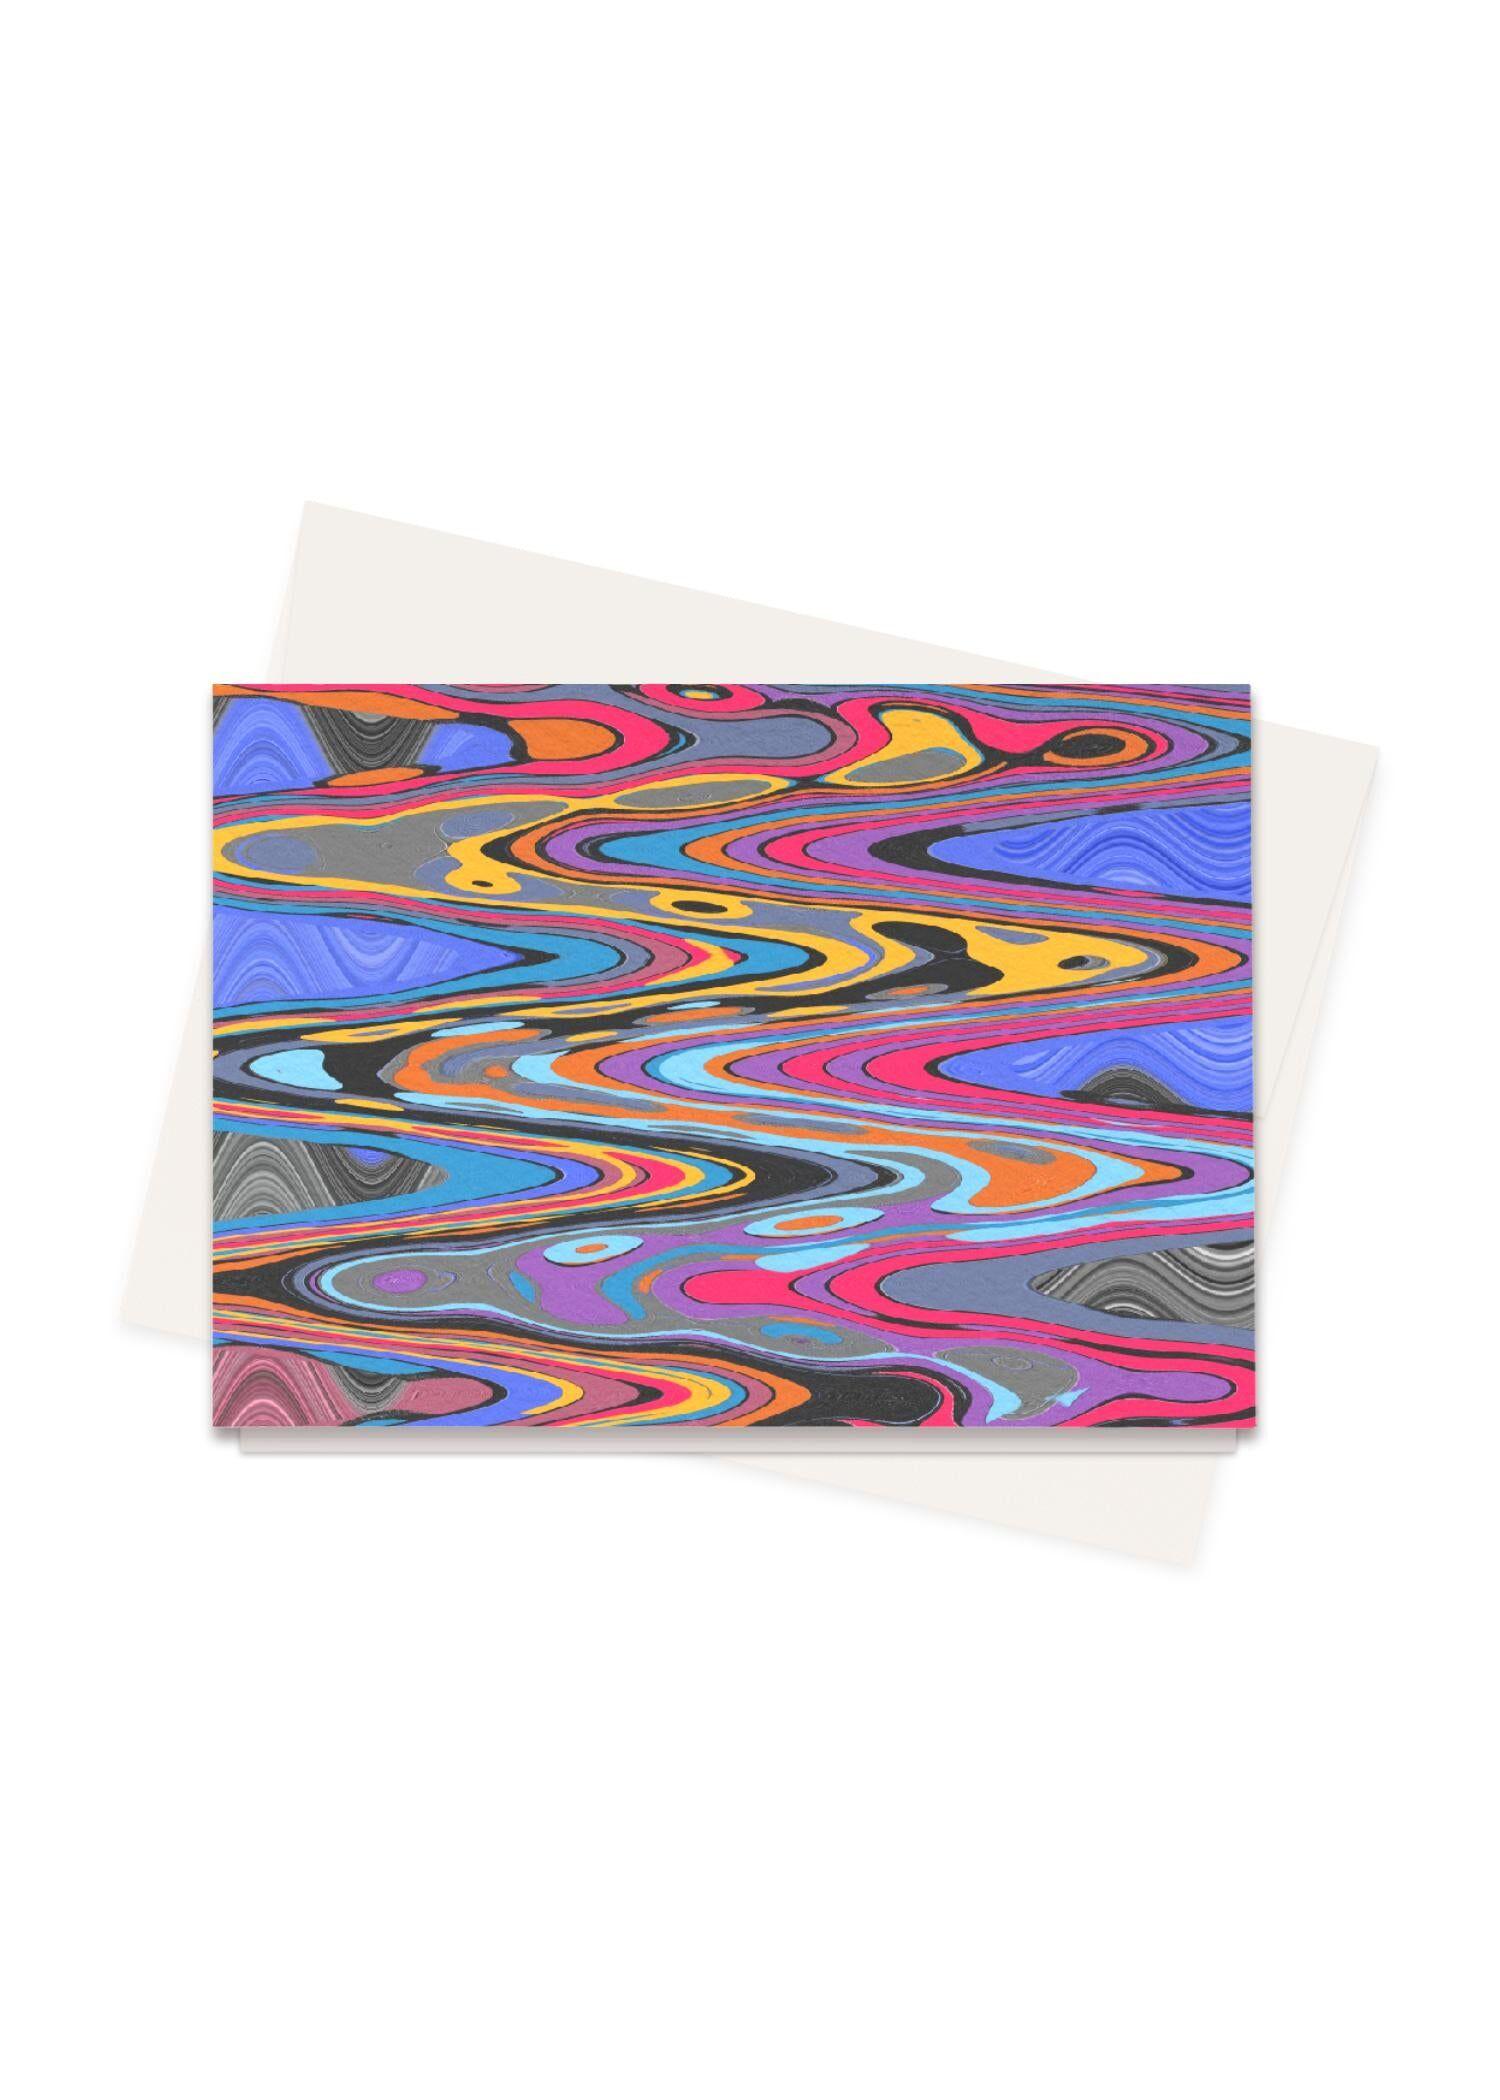 VIDA Greeting Cards Set - Vibration Pop Music 2021 by VIDA Original Artist  - Size: Set of 8